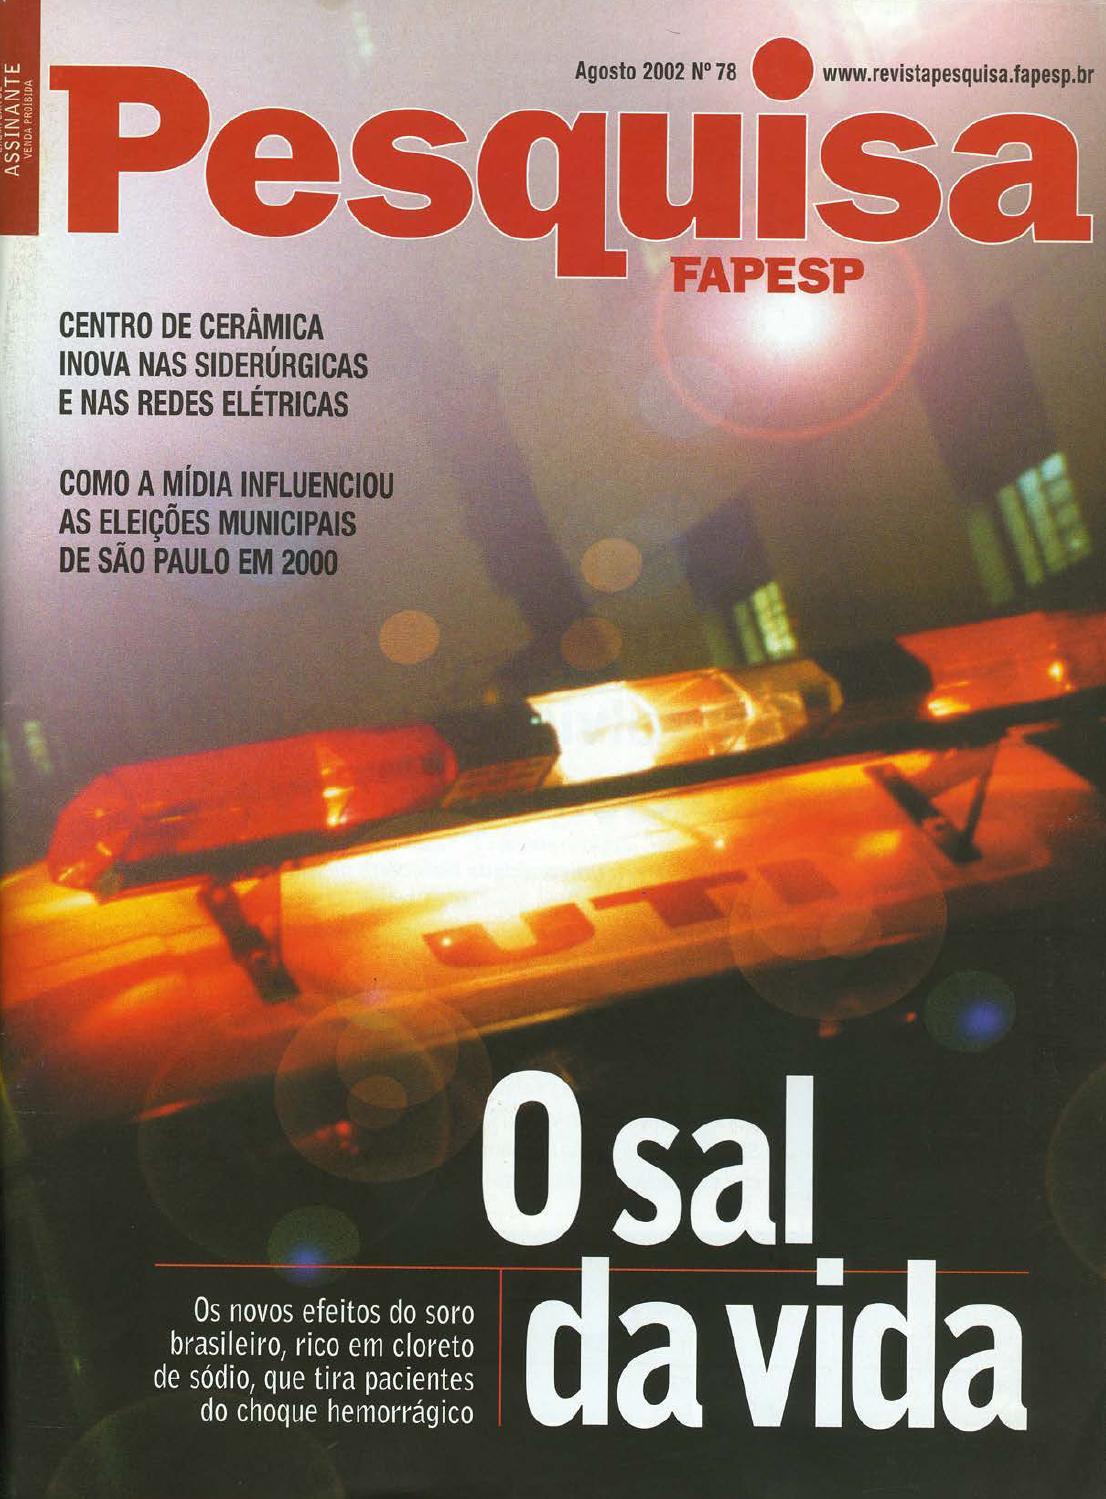 O sal da vida by Pesquisa Fapesp - issuu f765b6a9cc